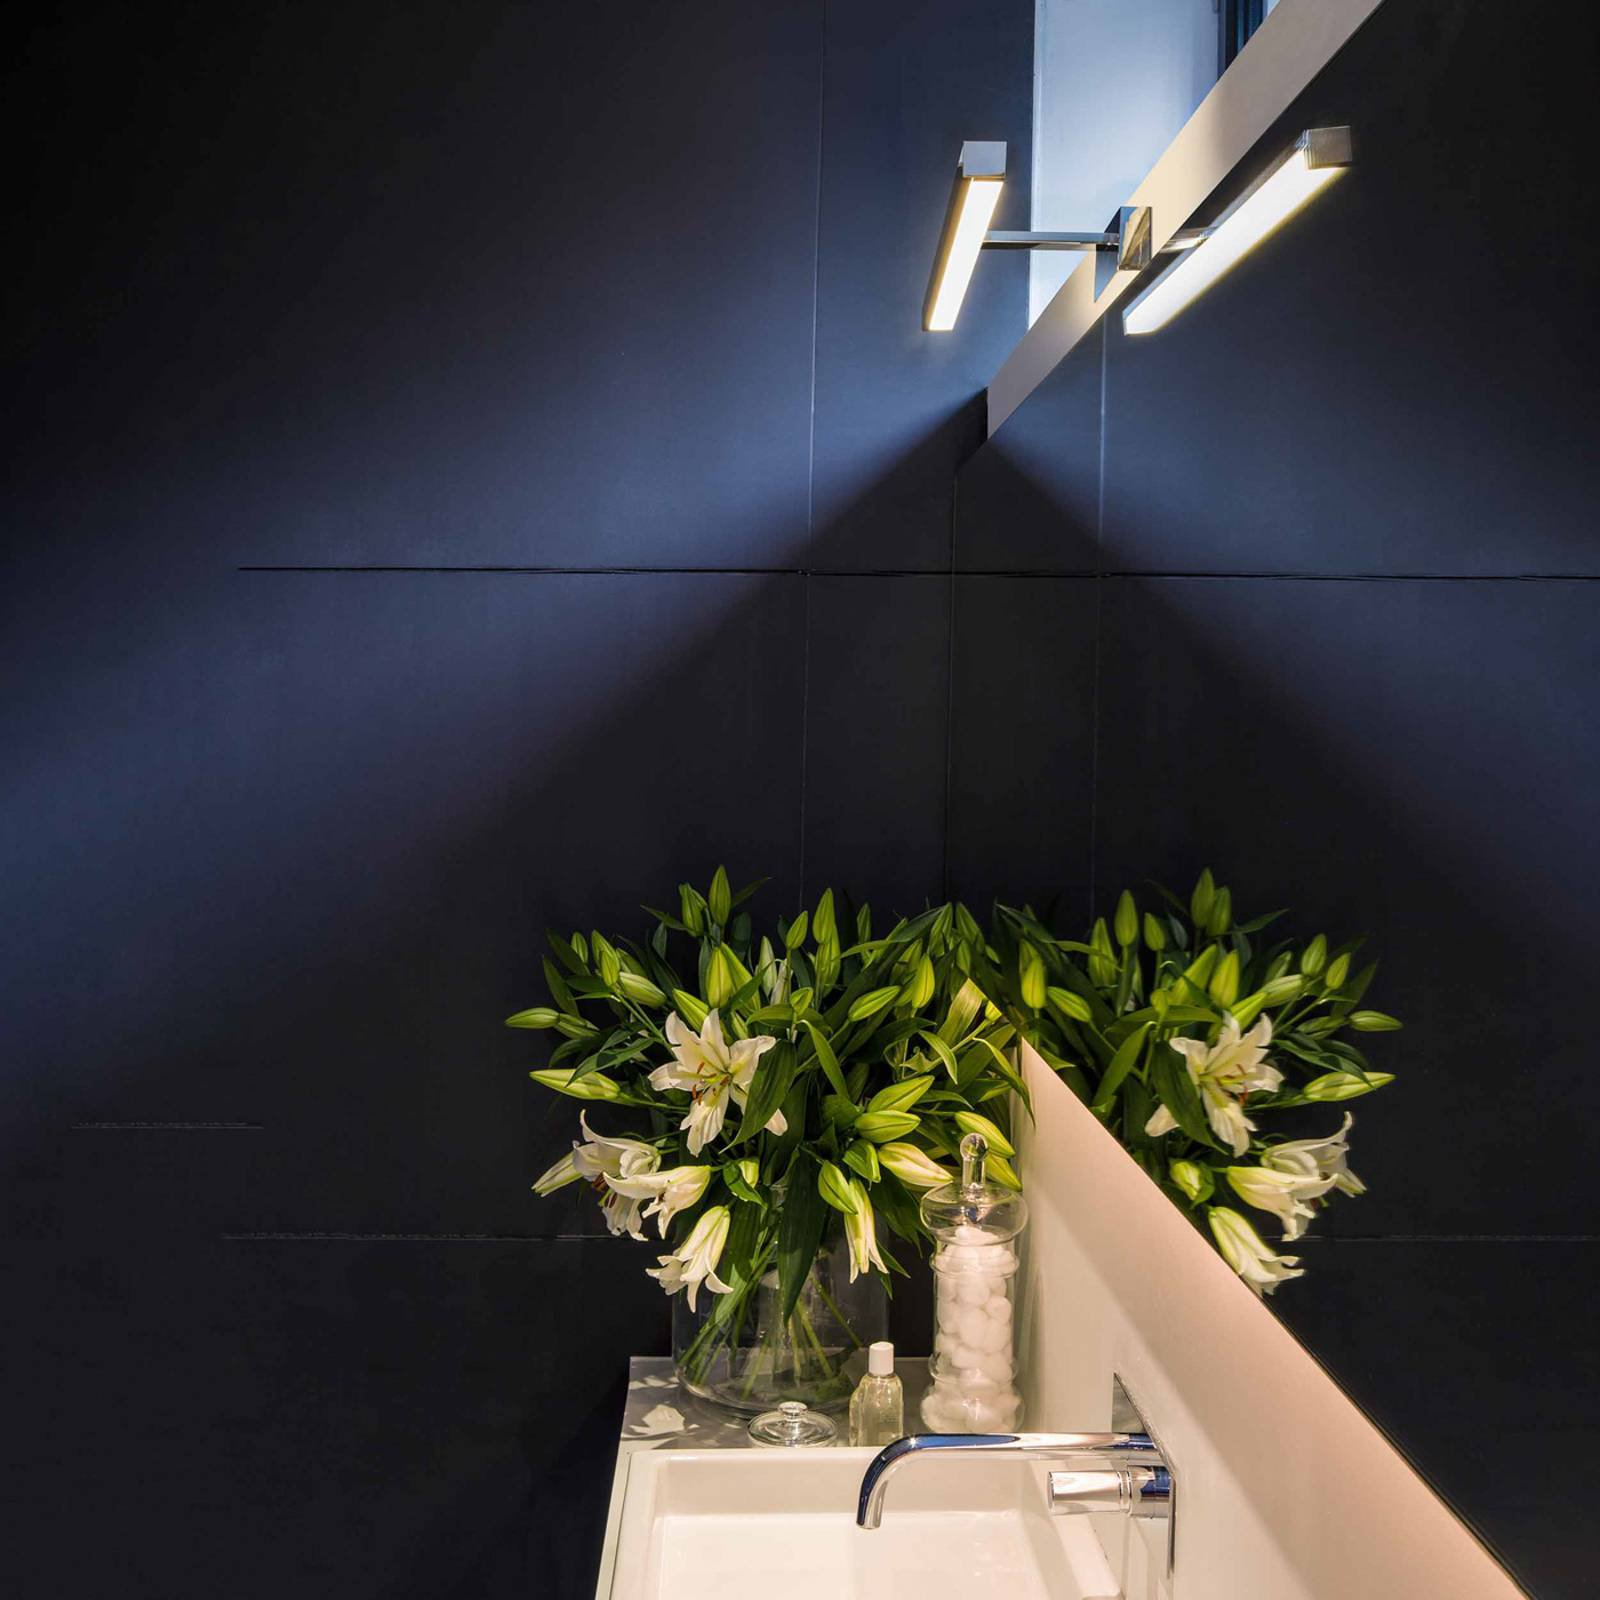 Astro Kashima 620 LED-speillampe, krom, 62 cm